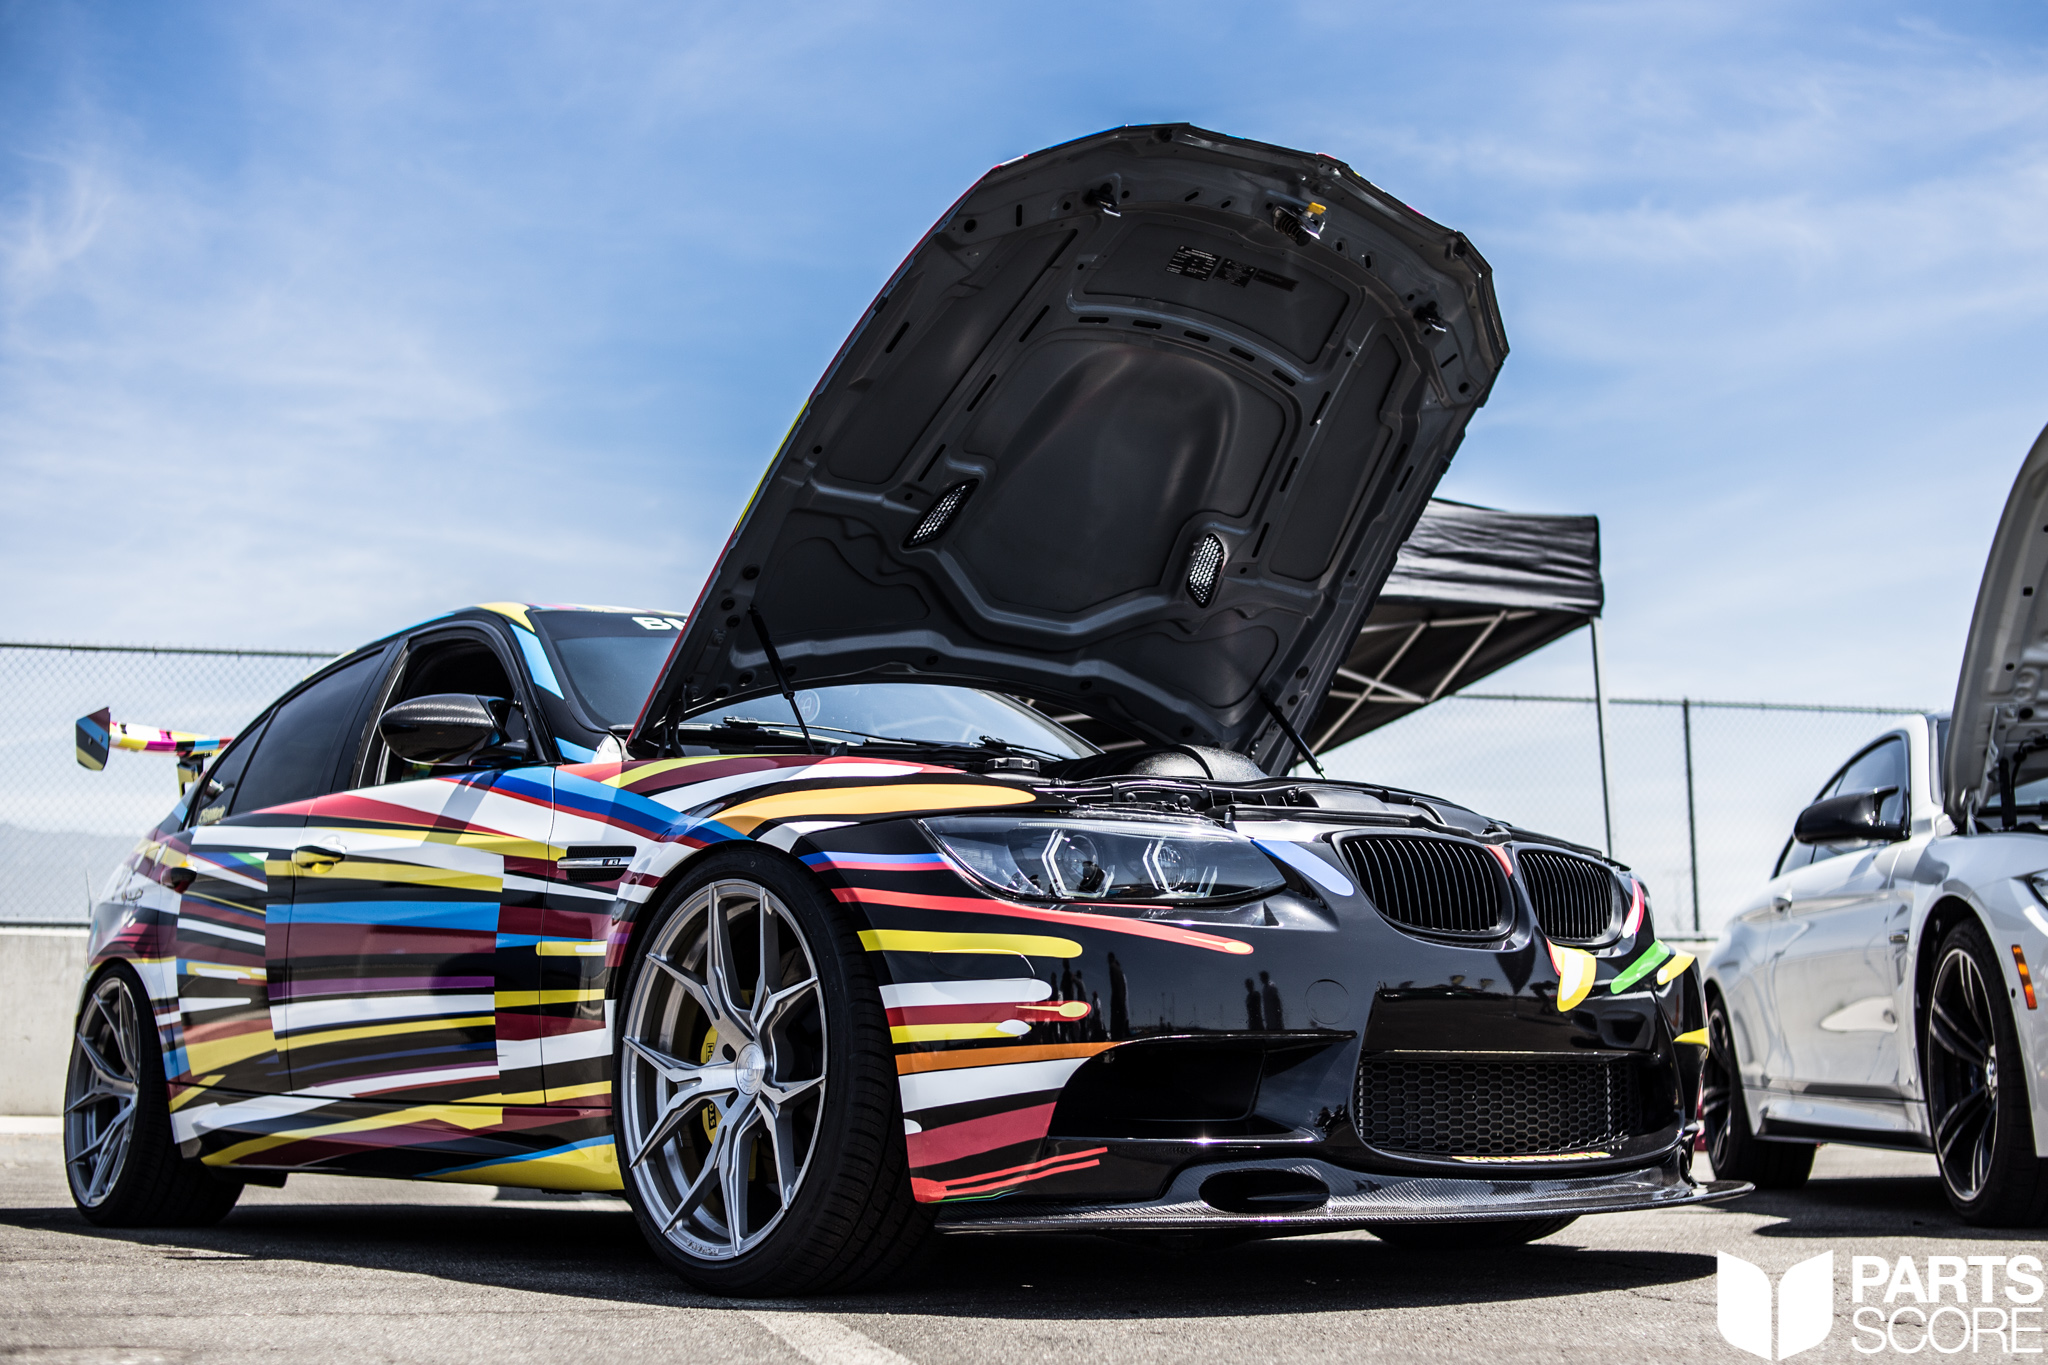 2017, arizona bmw, art car, artcar, bagged, bbs wheels, bimmer, Bimmerfest, bimmerfest 2017, bimmerfest17 #bimmerfest 17, Bimmerfest2016, BMW, bmw art car, bmw classic, bmw fast, bmw fest, bmw individual, bmw m, bmw m performance, bmw m power, bmw m3, bmw north america, bmw show, bmw supercharger, bmwartcar, bmwf80, bmwf82, bmwf83, bmwf8x, bmwgram, bmwgramm, bmwm, bmwm3, bmwm4, bmwm5, bmwmods, bmwmotorsport, bmwmperformance, bmwmpower, BMWNA, bmwnation, BMWNorthAmerica, bmwracing, bmwstance, boost, california, car show, carbon, carbonfiber, cargram, cargramm, carshow, chandler bmw, csfrace, downforce, dtm, dtmstyle, e90, e90m3, e92, e92m3, e93, ESS, ess tuning, ess tuning arizona, ess tuning install, esstuned, Esstuning, f80, f82, fast, gilbert bmw, insane, jeff koons, luxury, m power, m1, m2, m3, m4, m5, make my bmw faster, mclarenf1, mesa bmw, modification, motorsport, mperformance, mpower, Next100, parts score, partsscore, peoria, performance, performance bmw, phoenix, phoenix bmw, power, race car, racecar, racing, rw carbon, rwcarbon, s65, scottsdale, scottsdale az, scottsdale bmw, sheerdrivingpleasure, show, slammed, stance, static, Supercharged, supercharged m3, supercharger, supercharger installation, tempe, tempe bmw, toyo, toyotires, undertray, v8